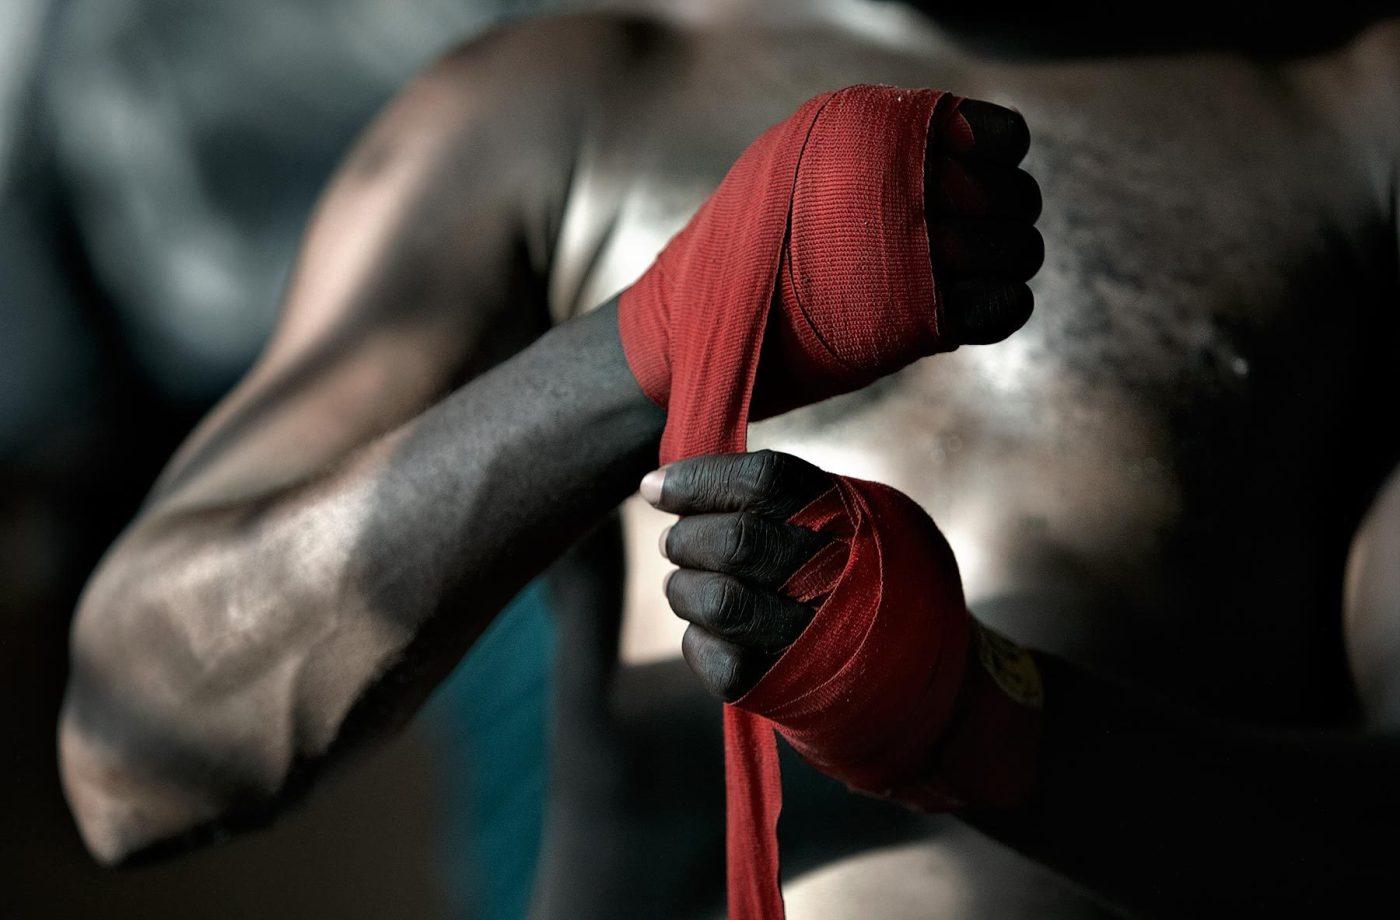 boxing-fist-wallpaper-1800x1184